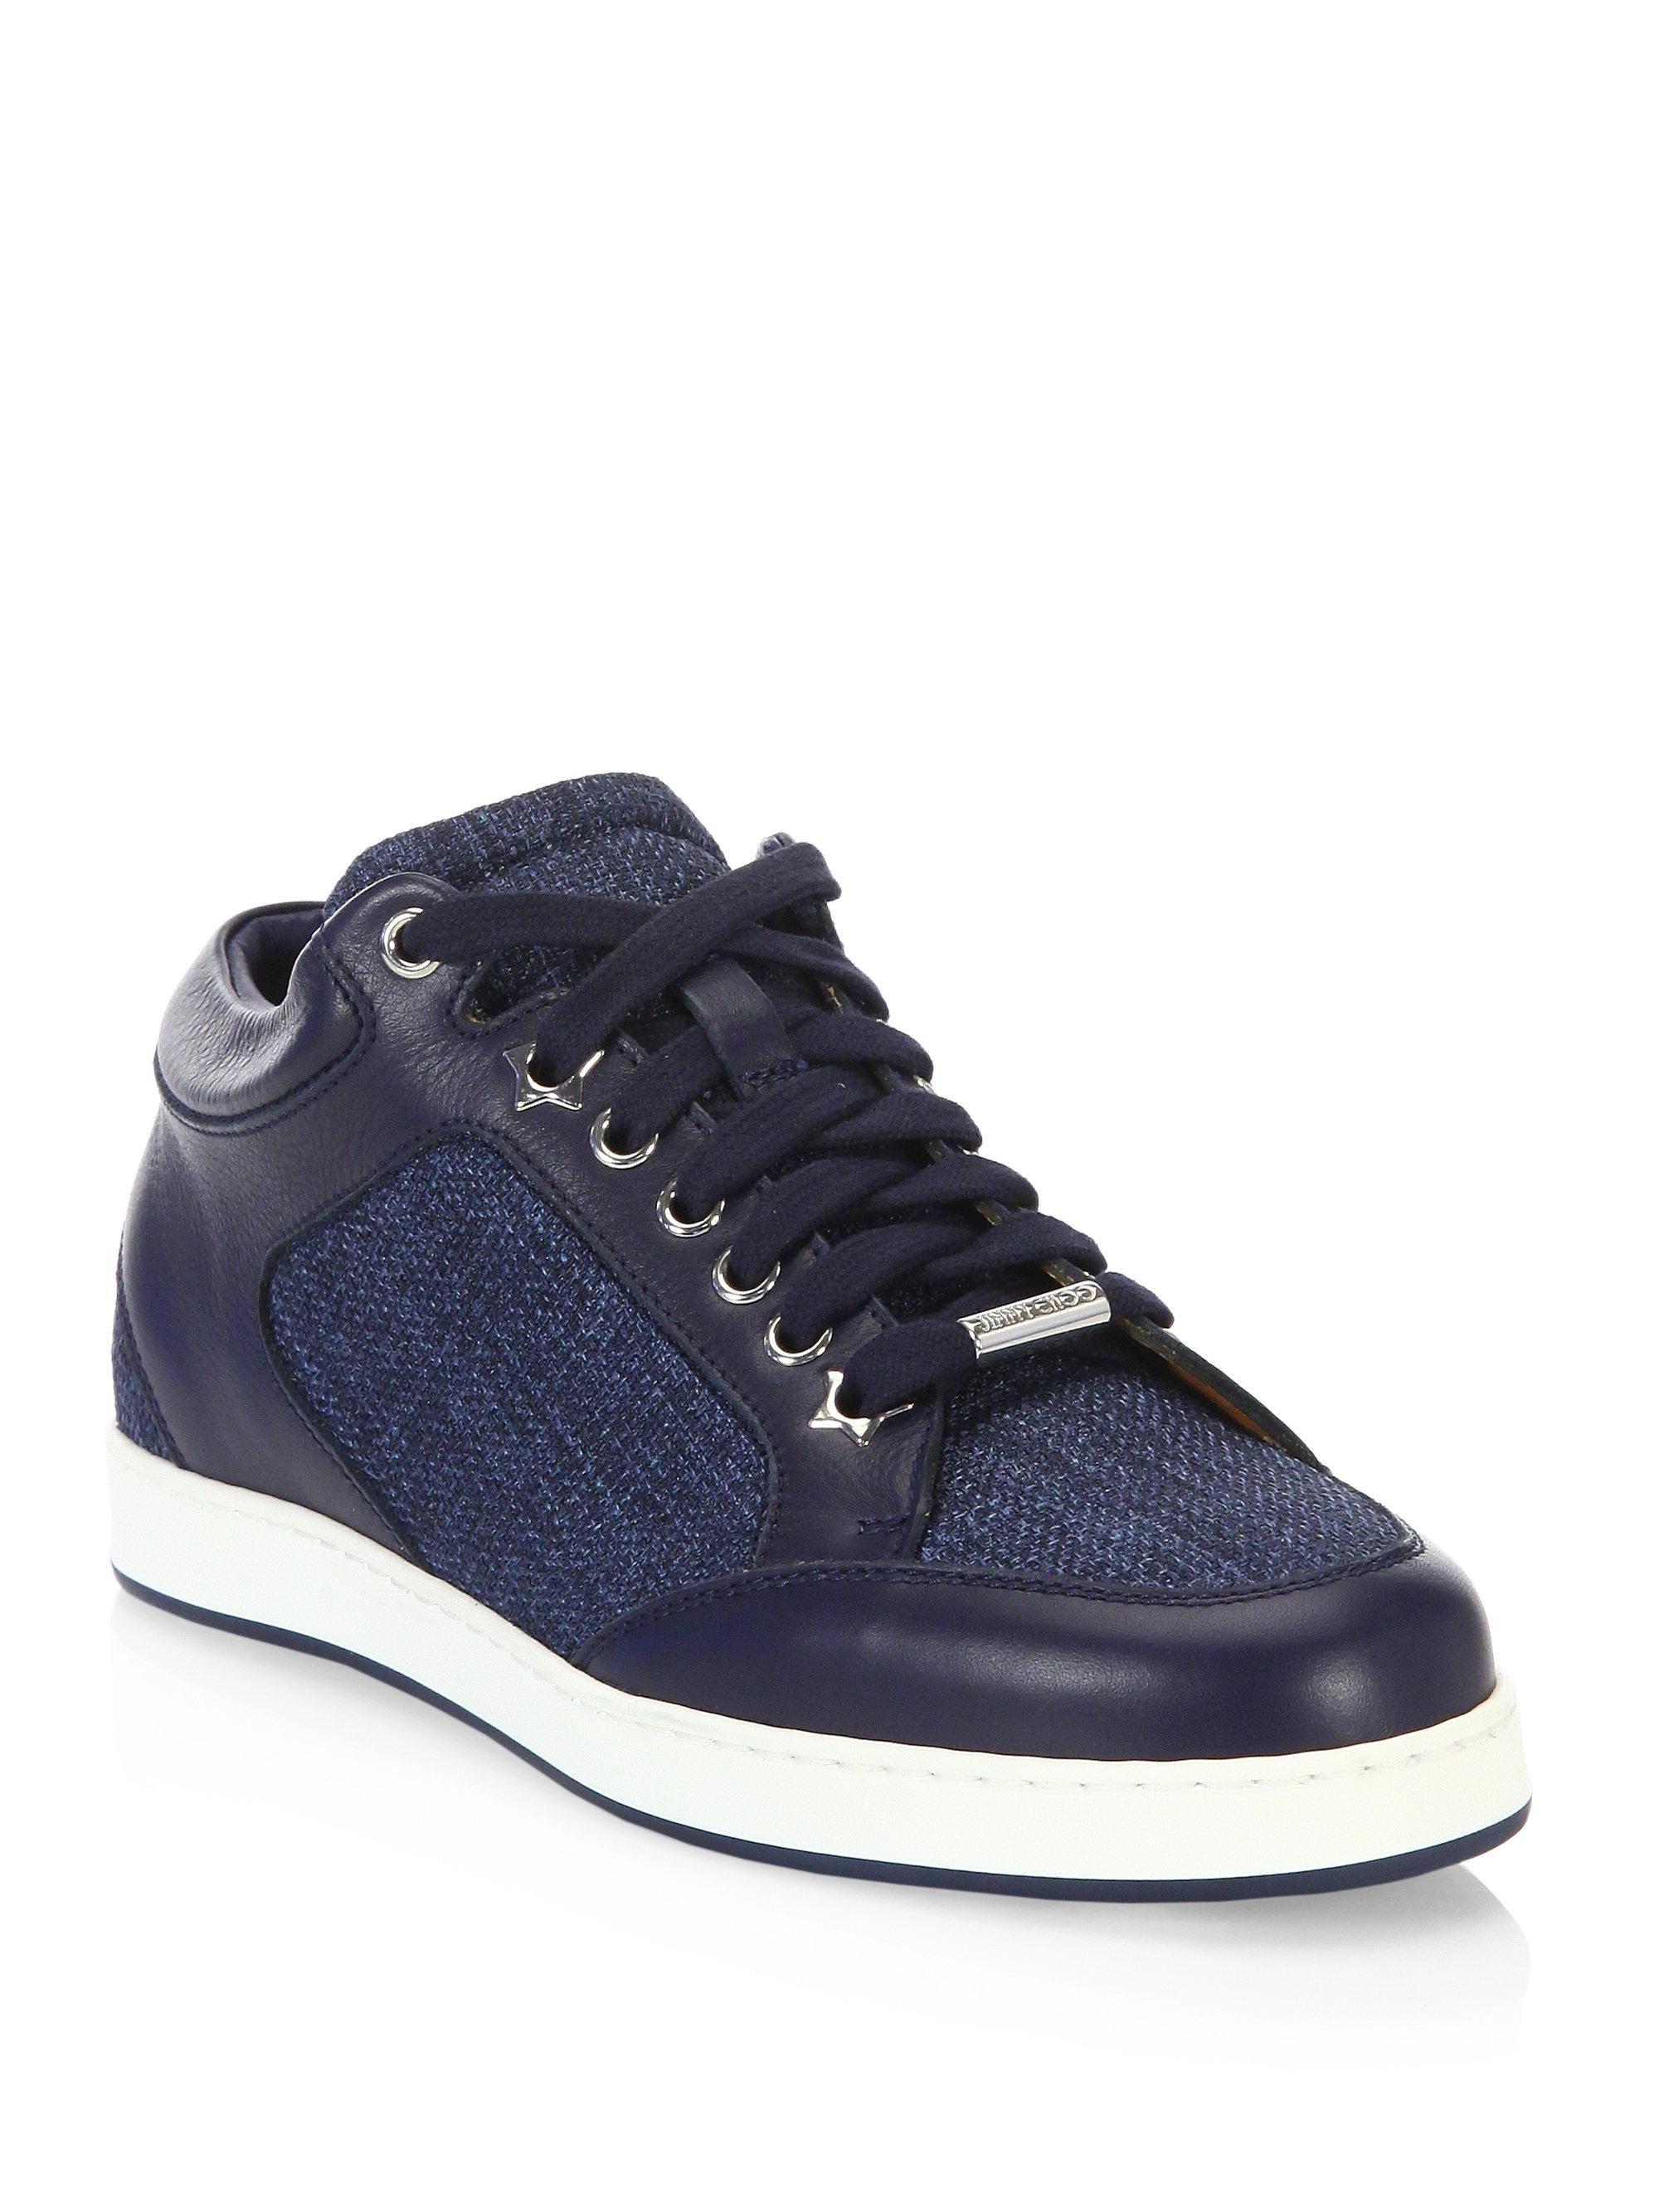 Jimmy choo Sneaker MIAMI calfskin Contrast stitching Glitter Logo